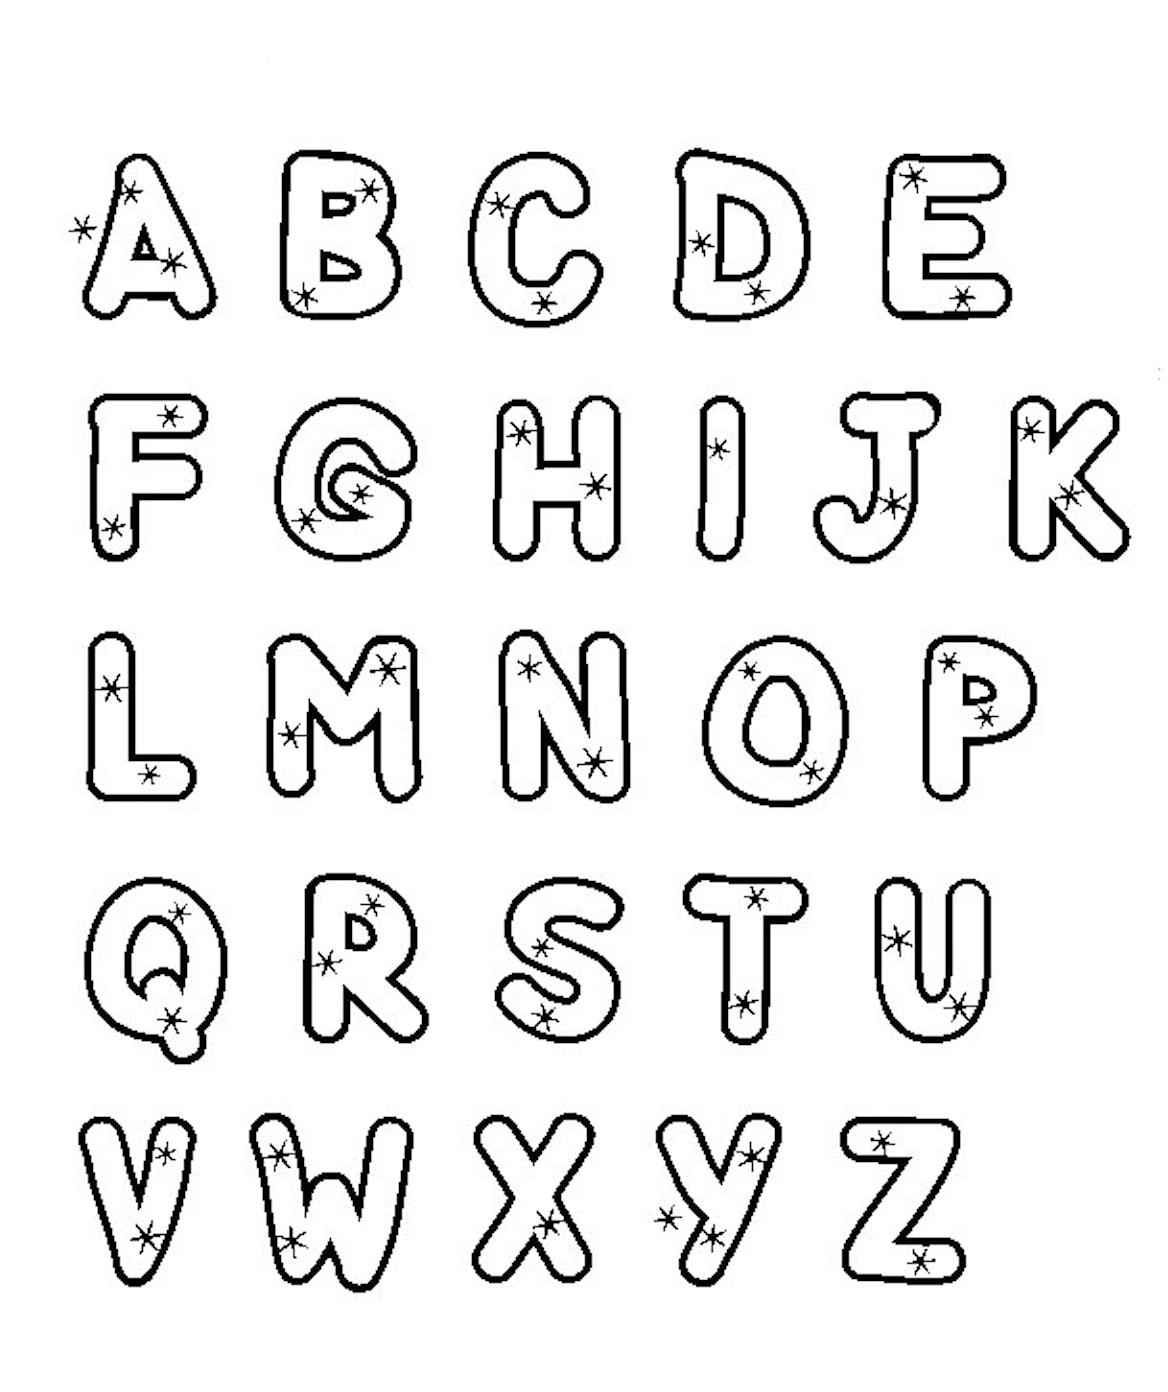 abc coloring sheets free printable alphabet coloring pages for kids best abc coloring sheets